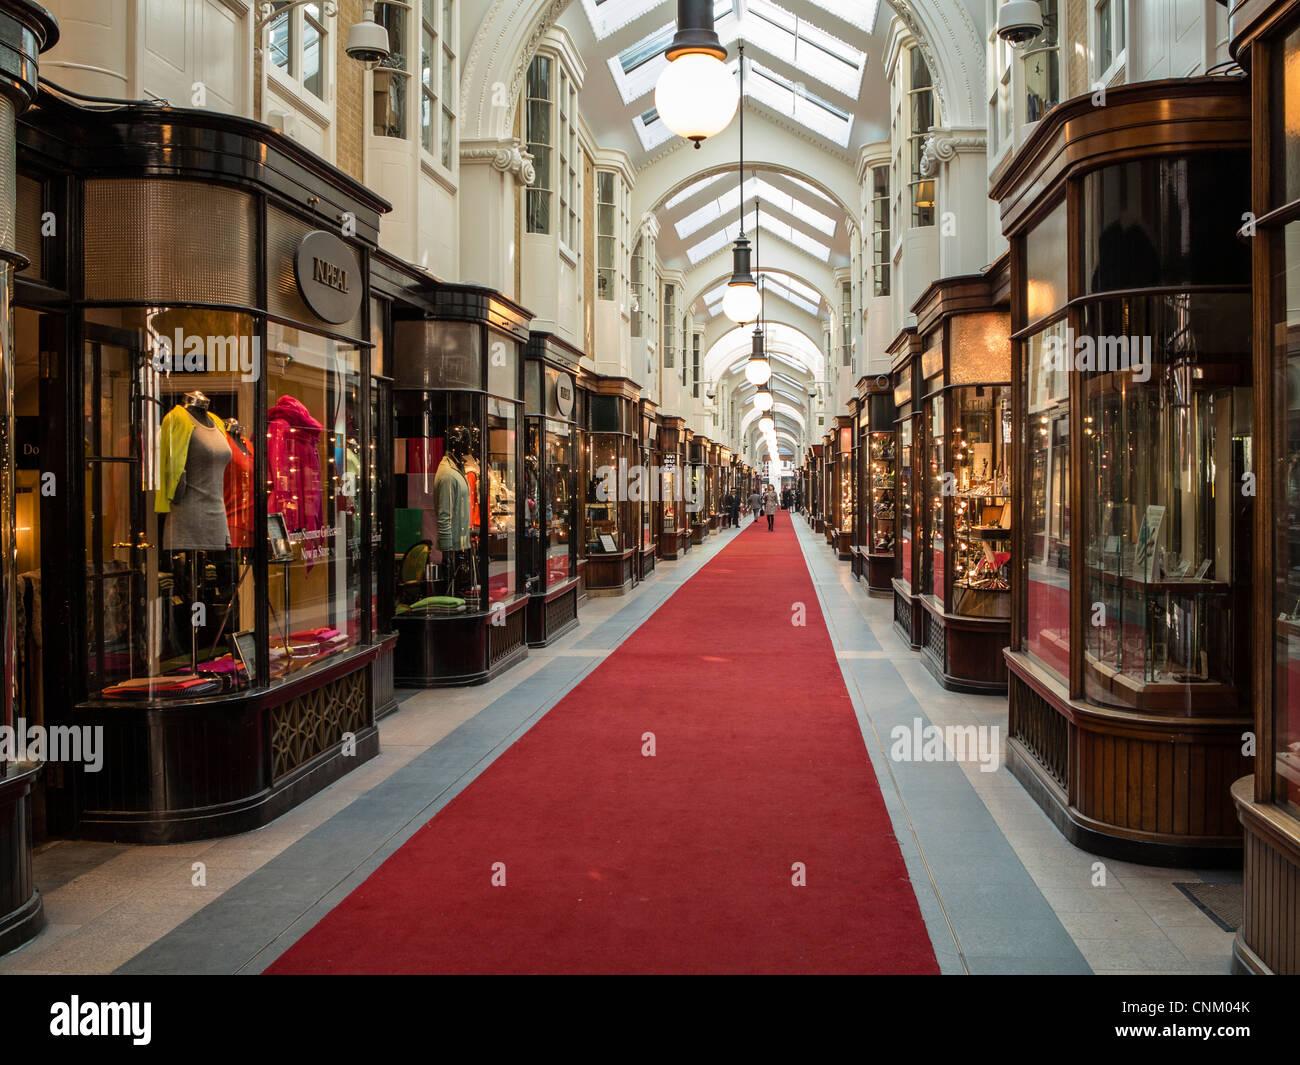 Burlington Arcade in central London, UK - Stock Image